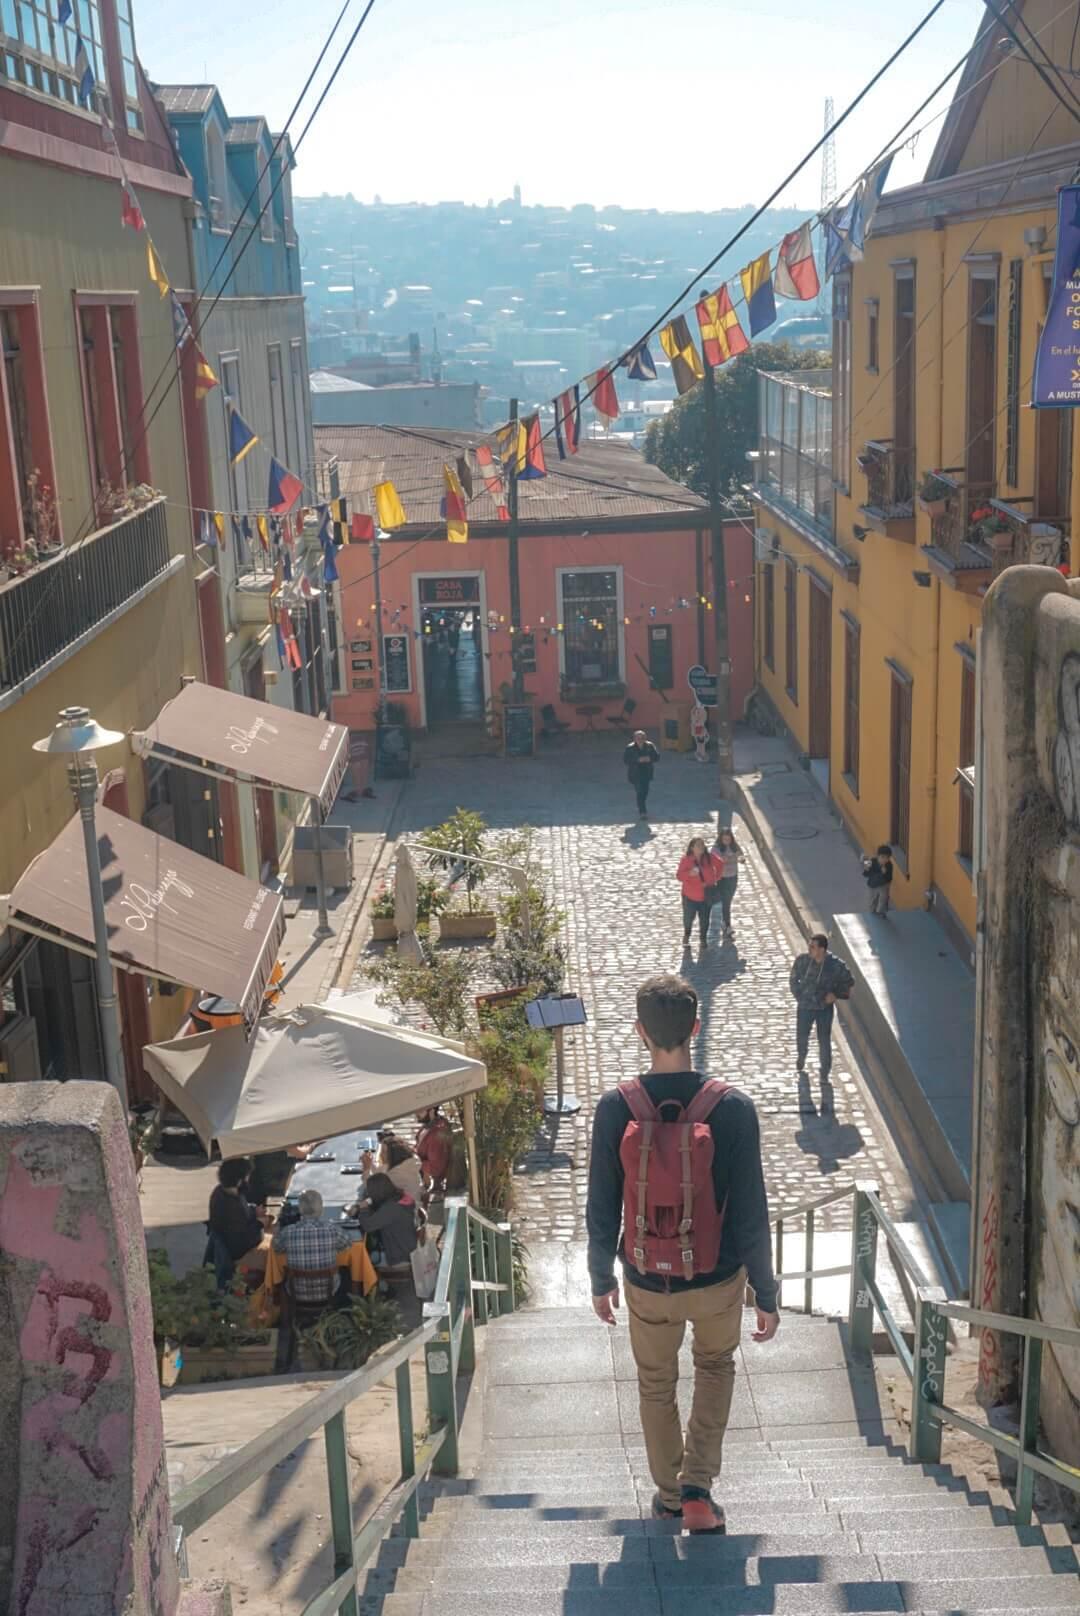 Valparaiso Chili Que faire